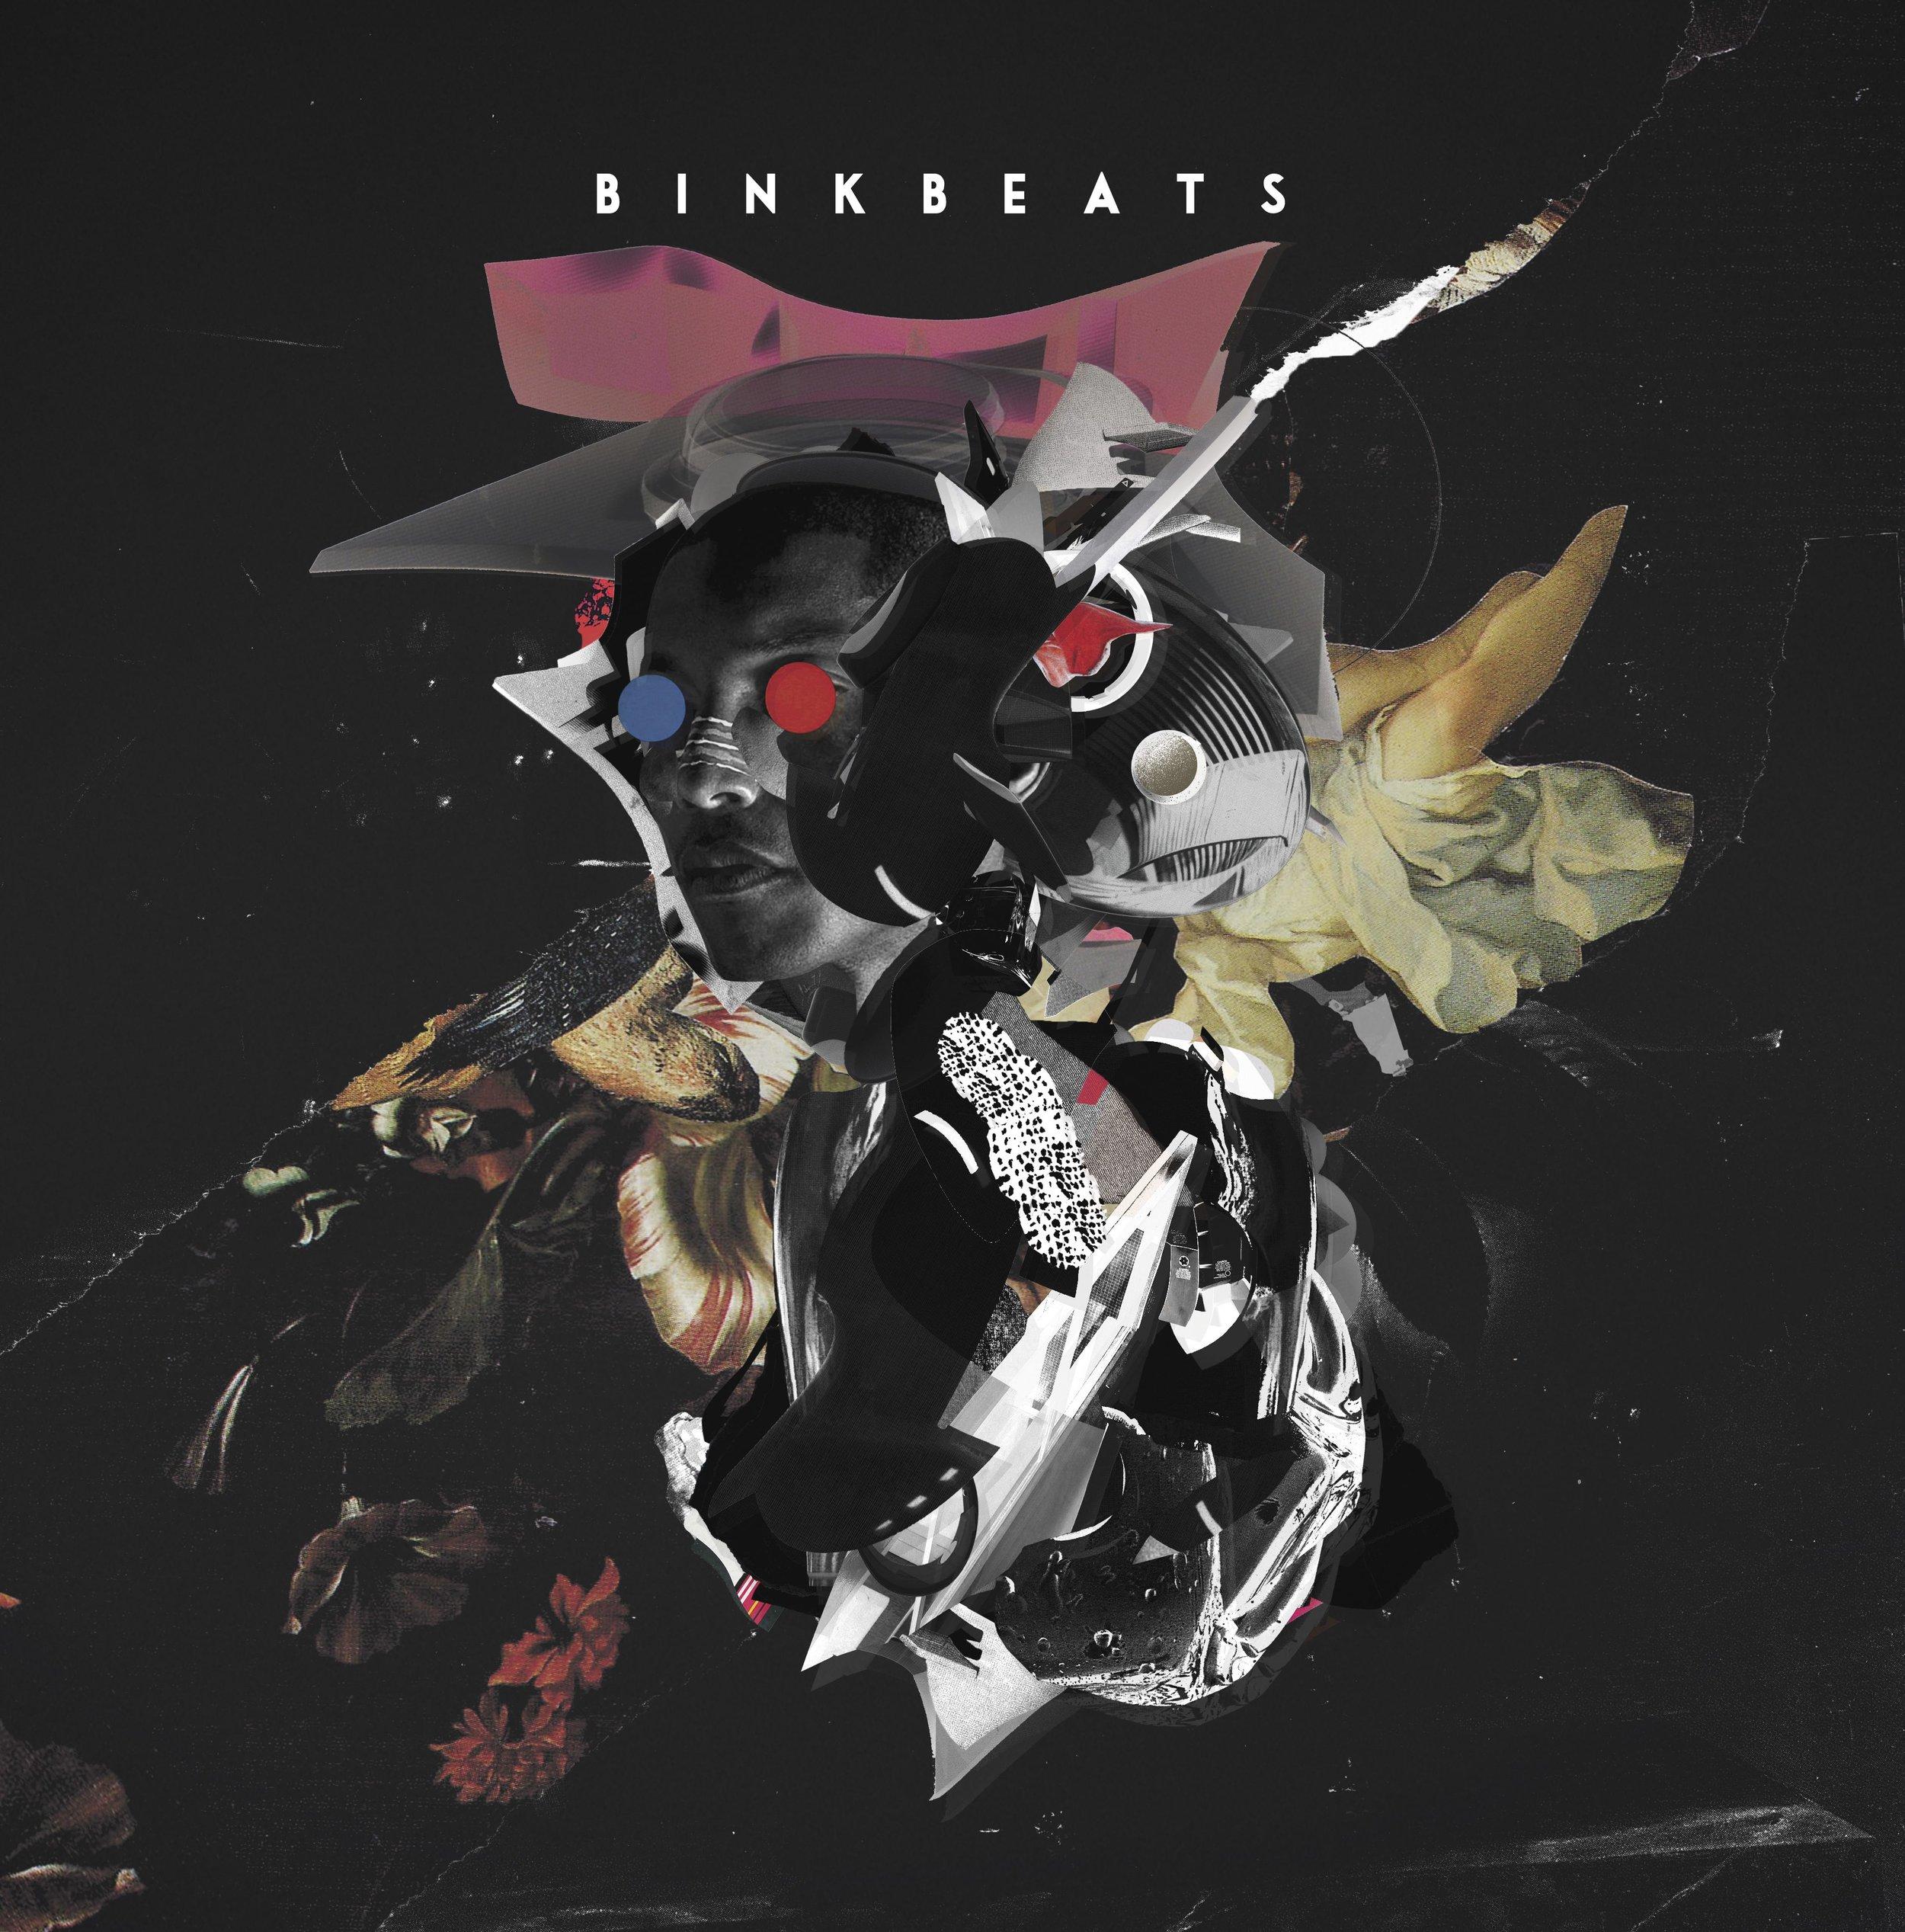 Binkbeats-PMPU-PART3_cover_lores.jpg